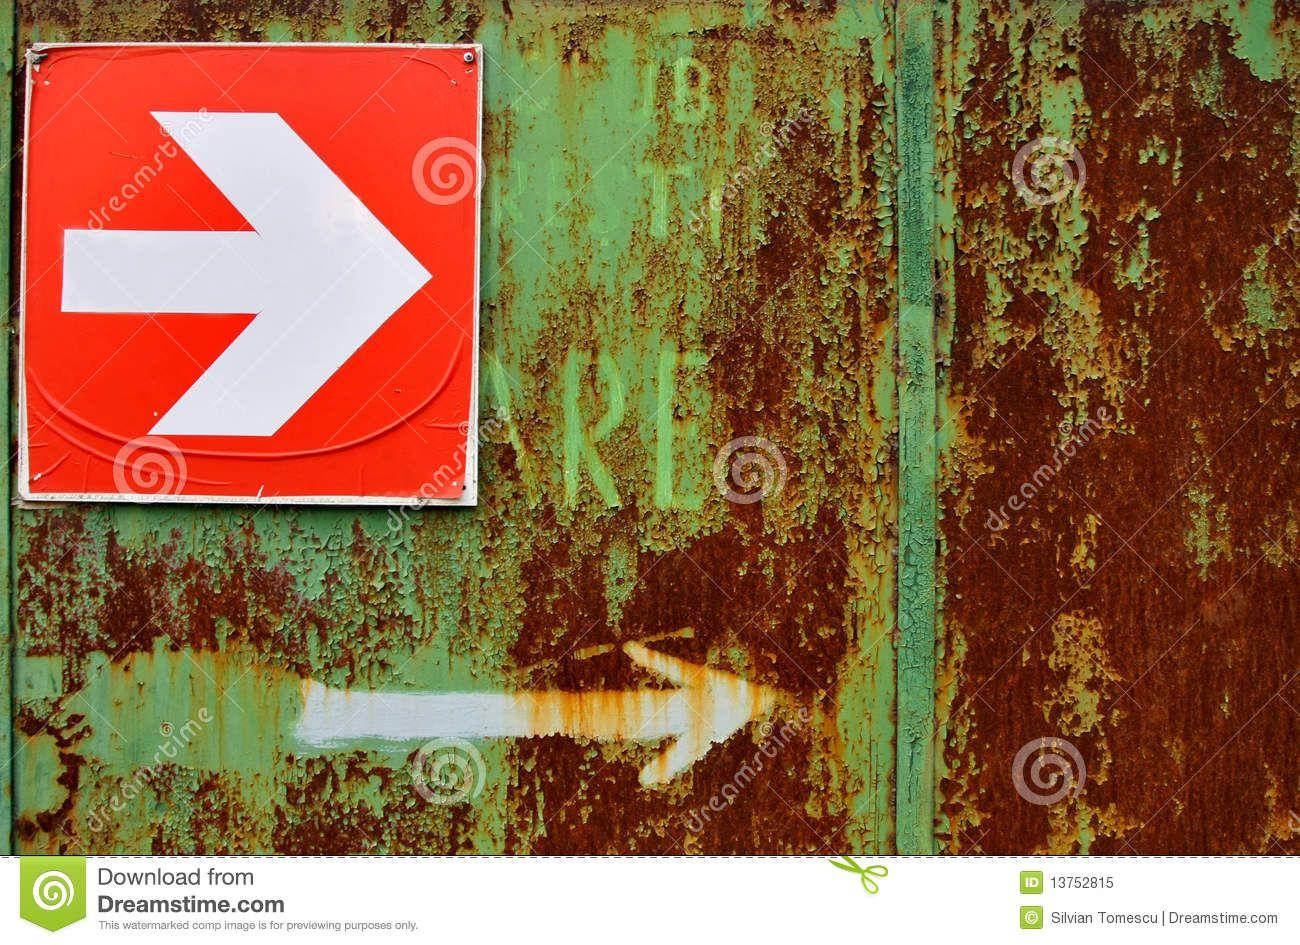 http://thumbs.dreamstime.com/z/rusty-arrow-sign-13752815.jpg